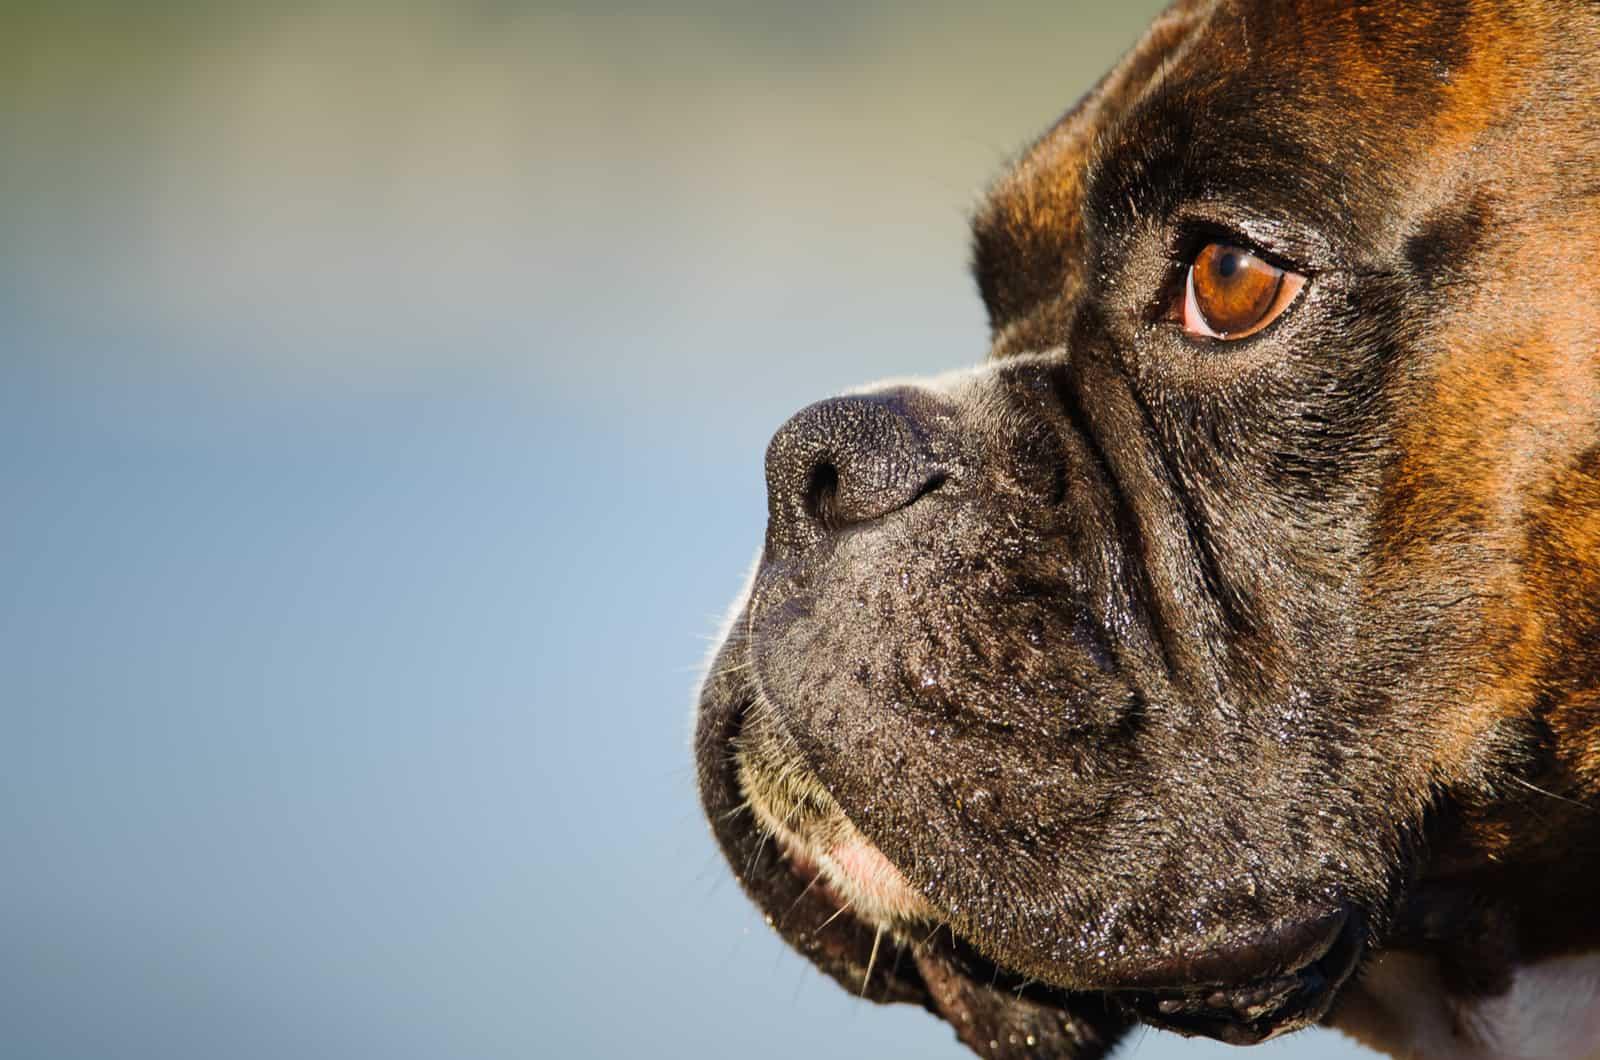 close-up photograph of a boxer dog's face